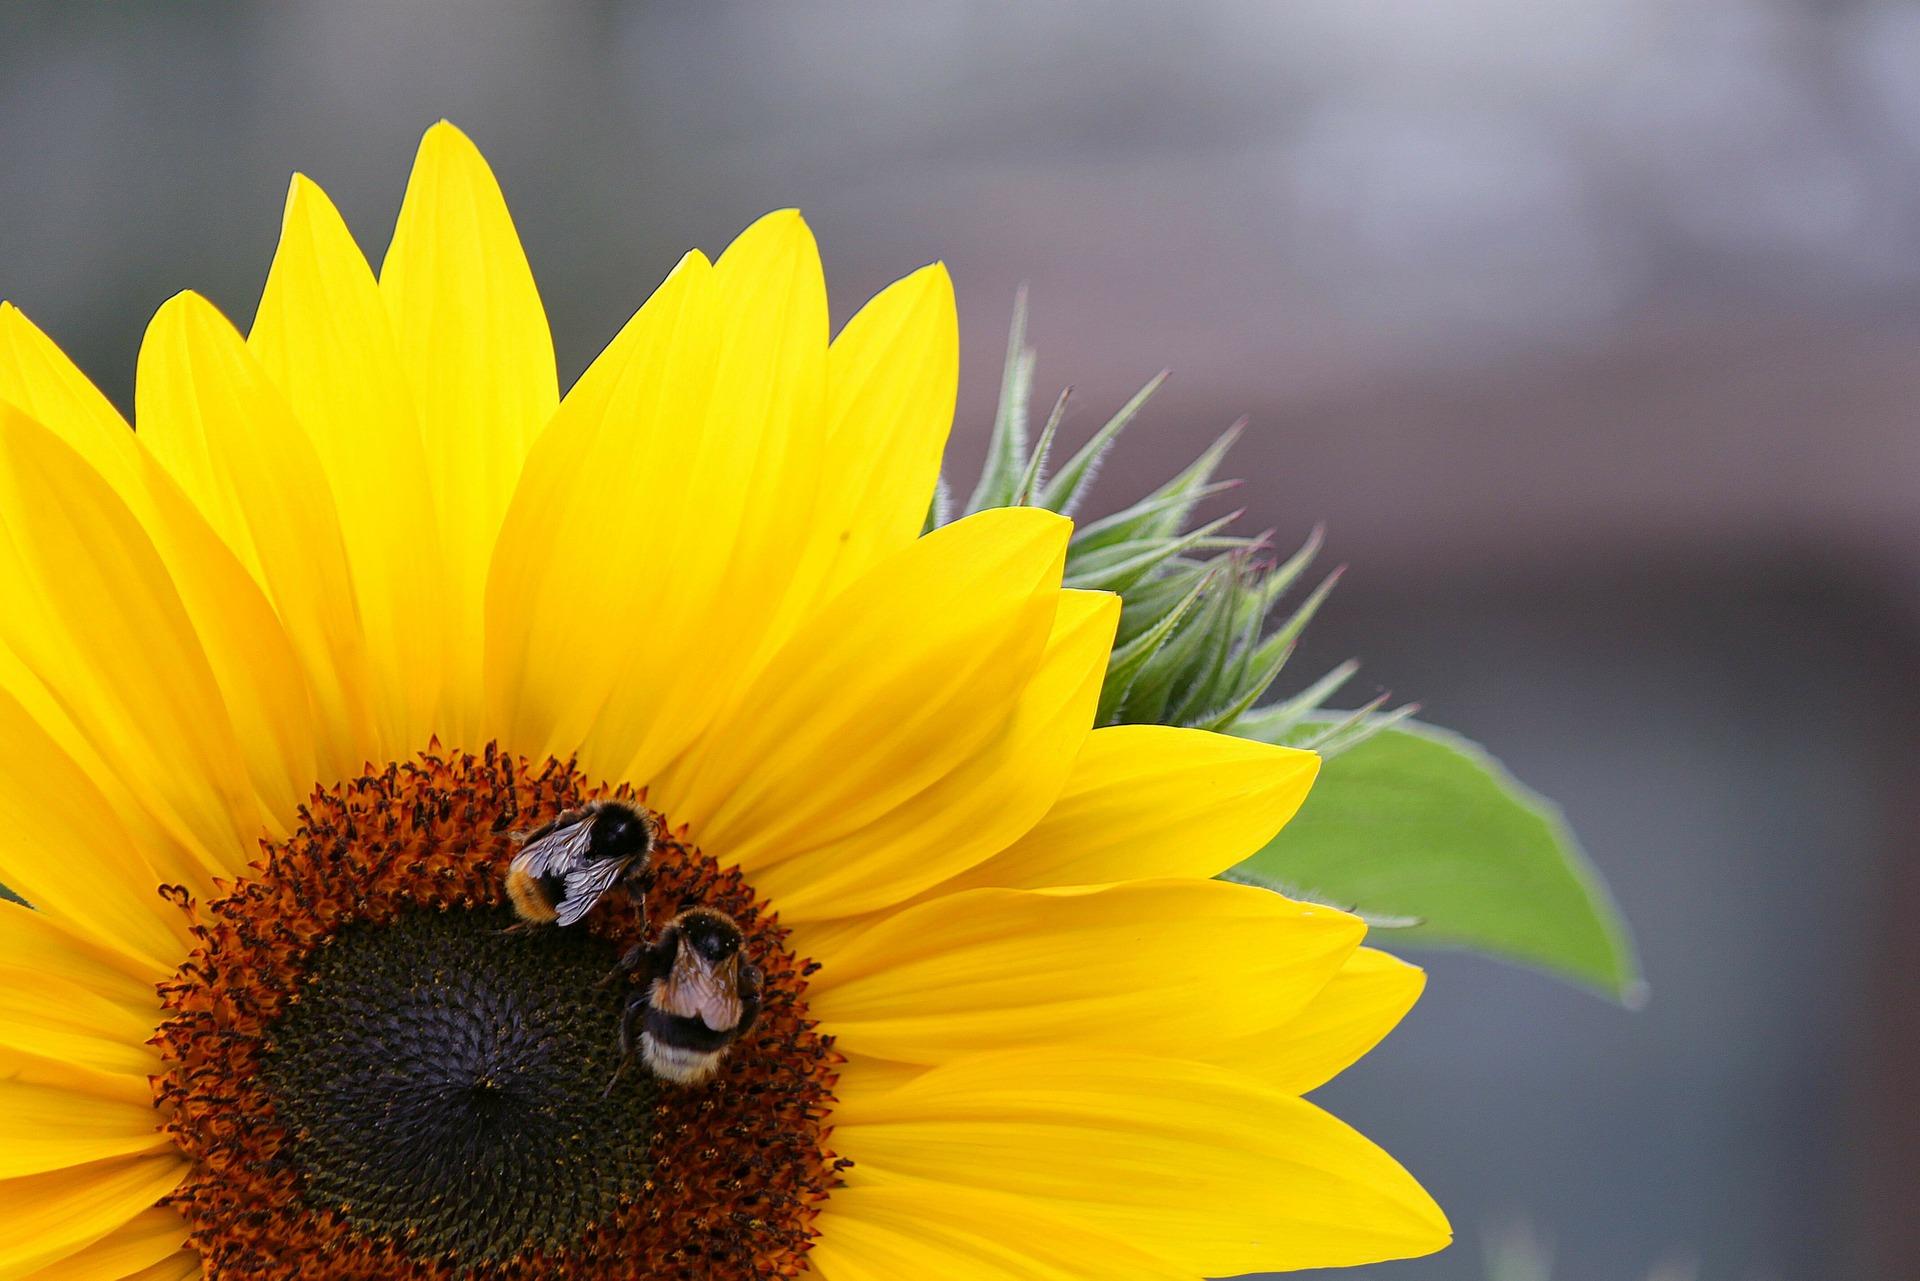 sun-flower-276869_1920